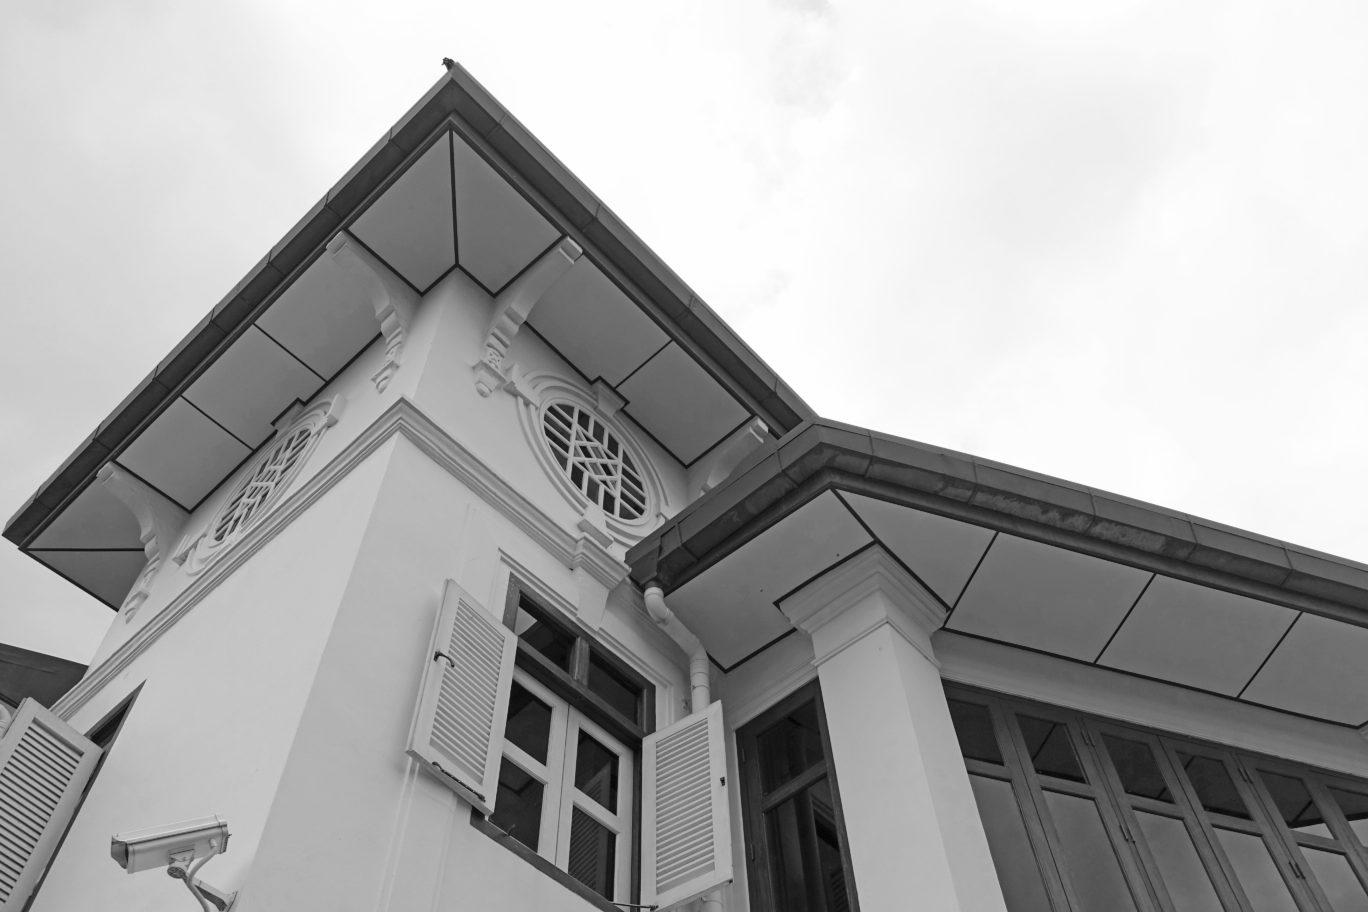 alkaff mansion ristorante singapore building ceiling